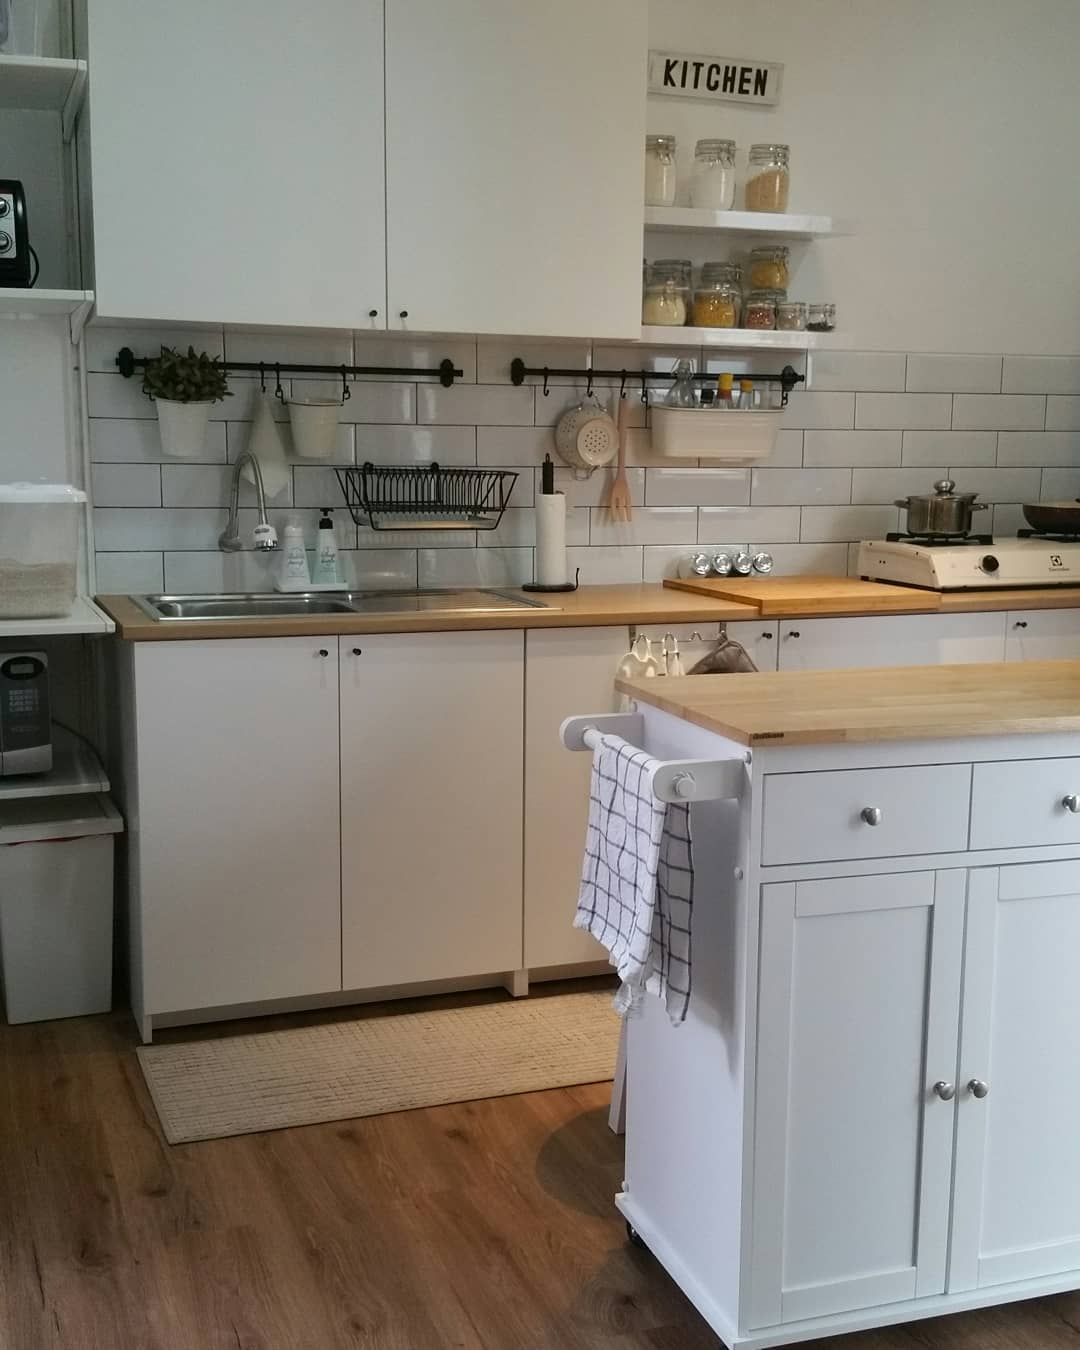 Ikea Knoxhult Pinterest Küche Ikea   Bosch Wasserkocher Tefal Küchenset